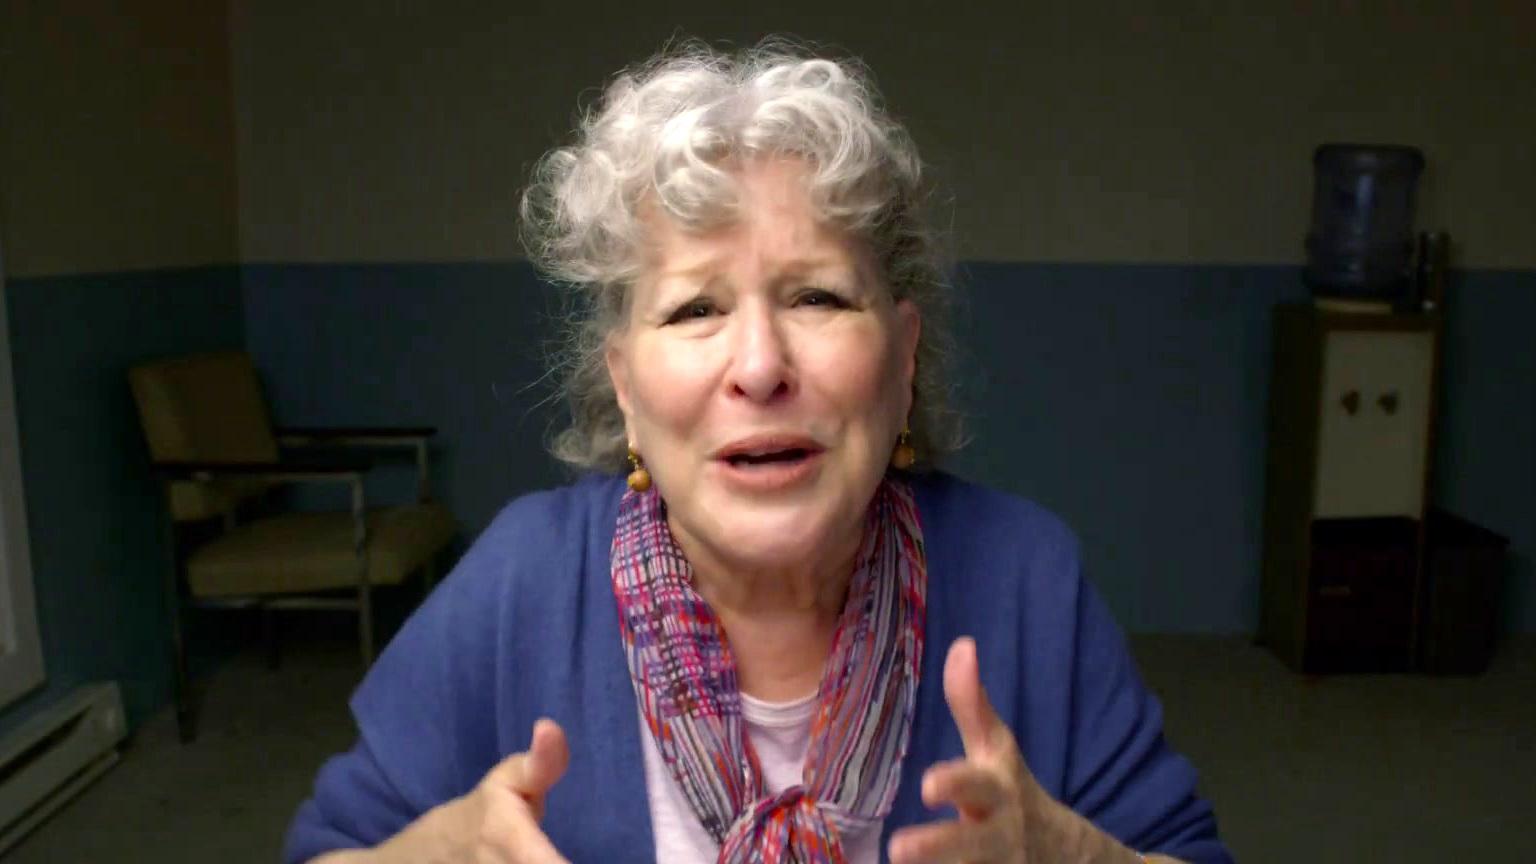 Coastal Elites: Bette Midler Is Miriam